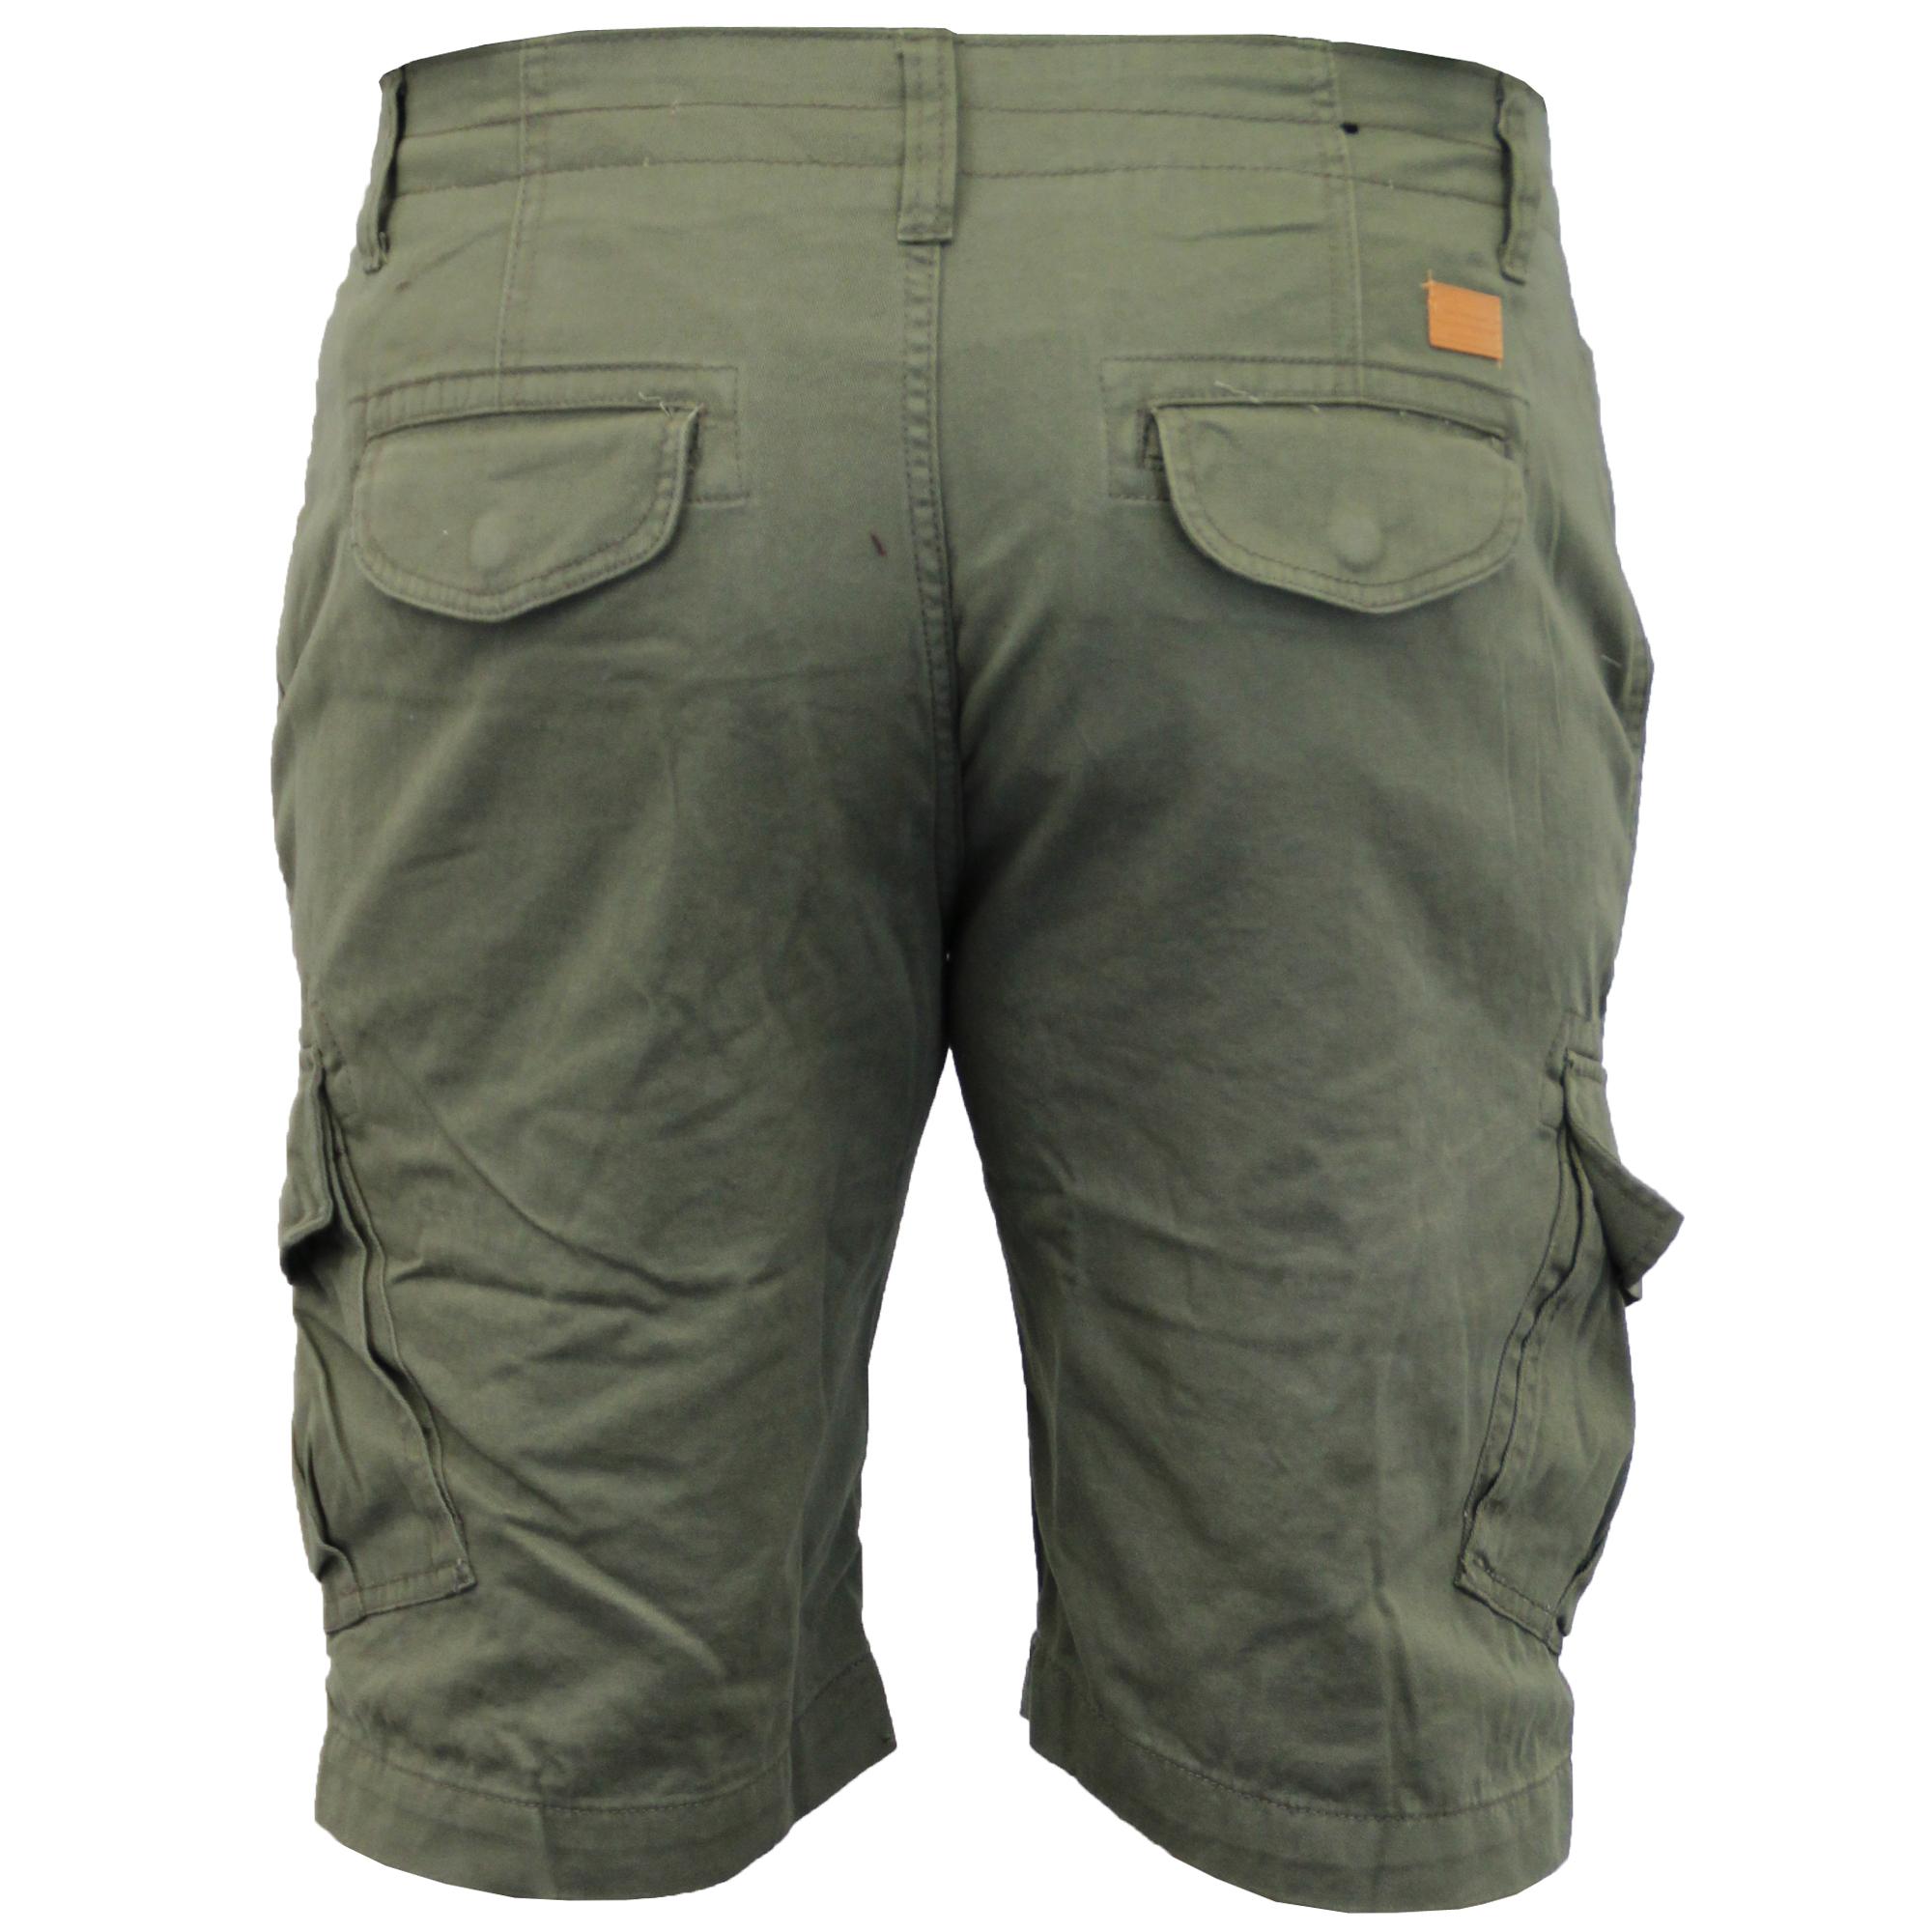 Mens-Cargo-Chino-Shorts-Threadbare-Combat-Knee-Length-Westace-Military-Summer thumbnail 19